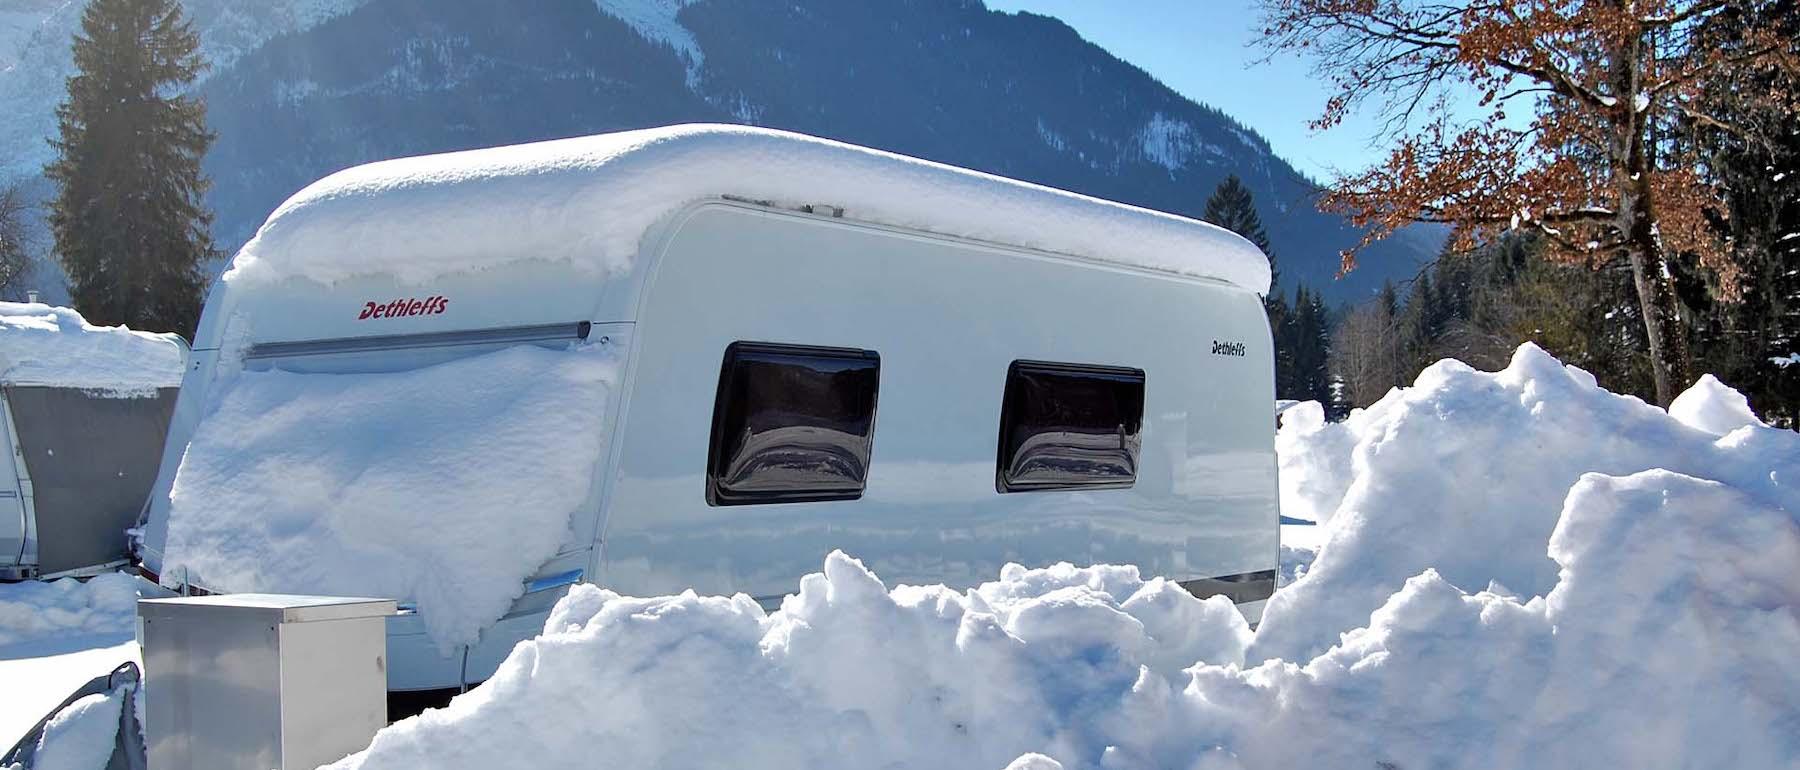 adac-ev_touristik_wintercamping_2